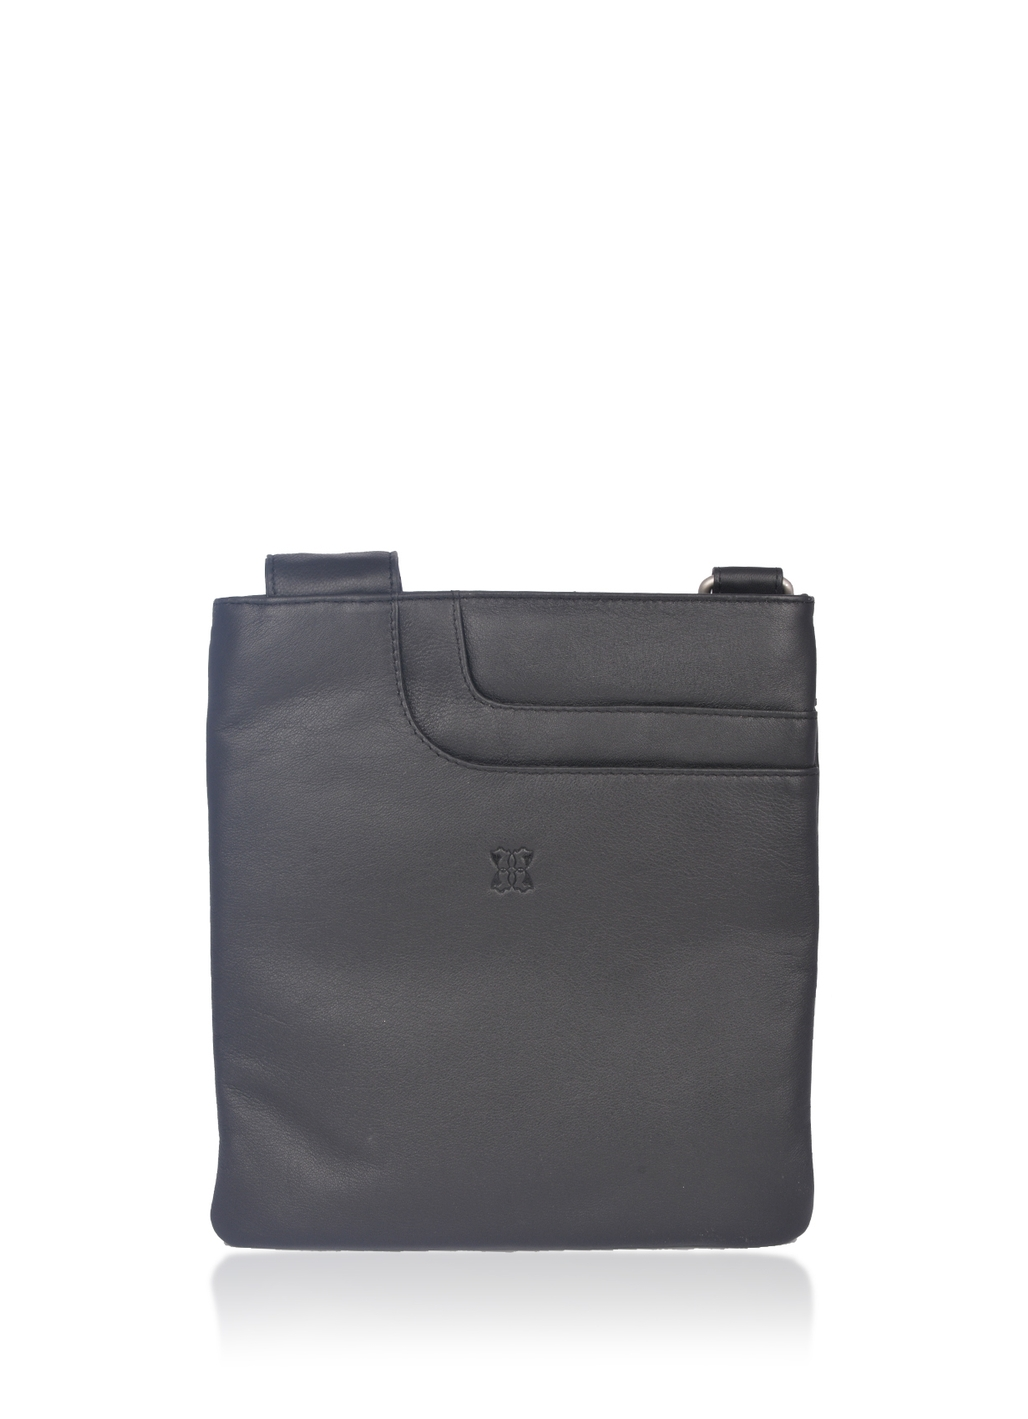 Alexsis Leather Cross Body Bag in Black